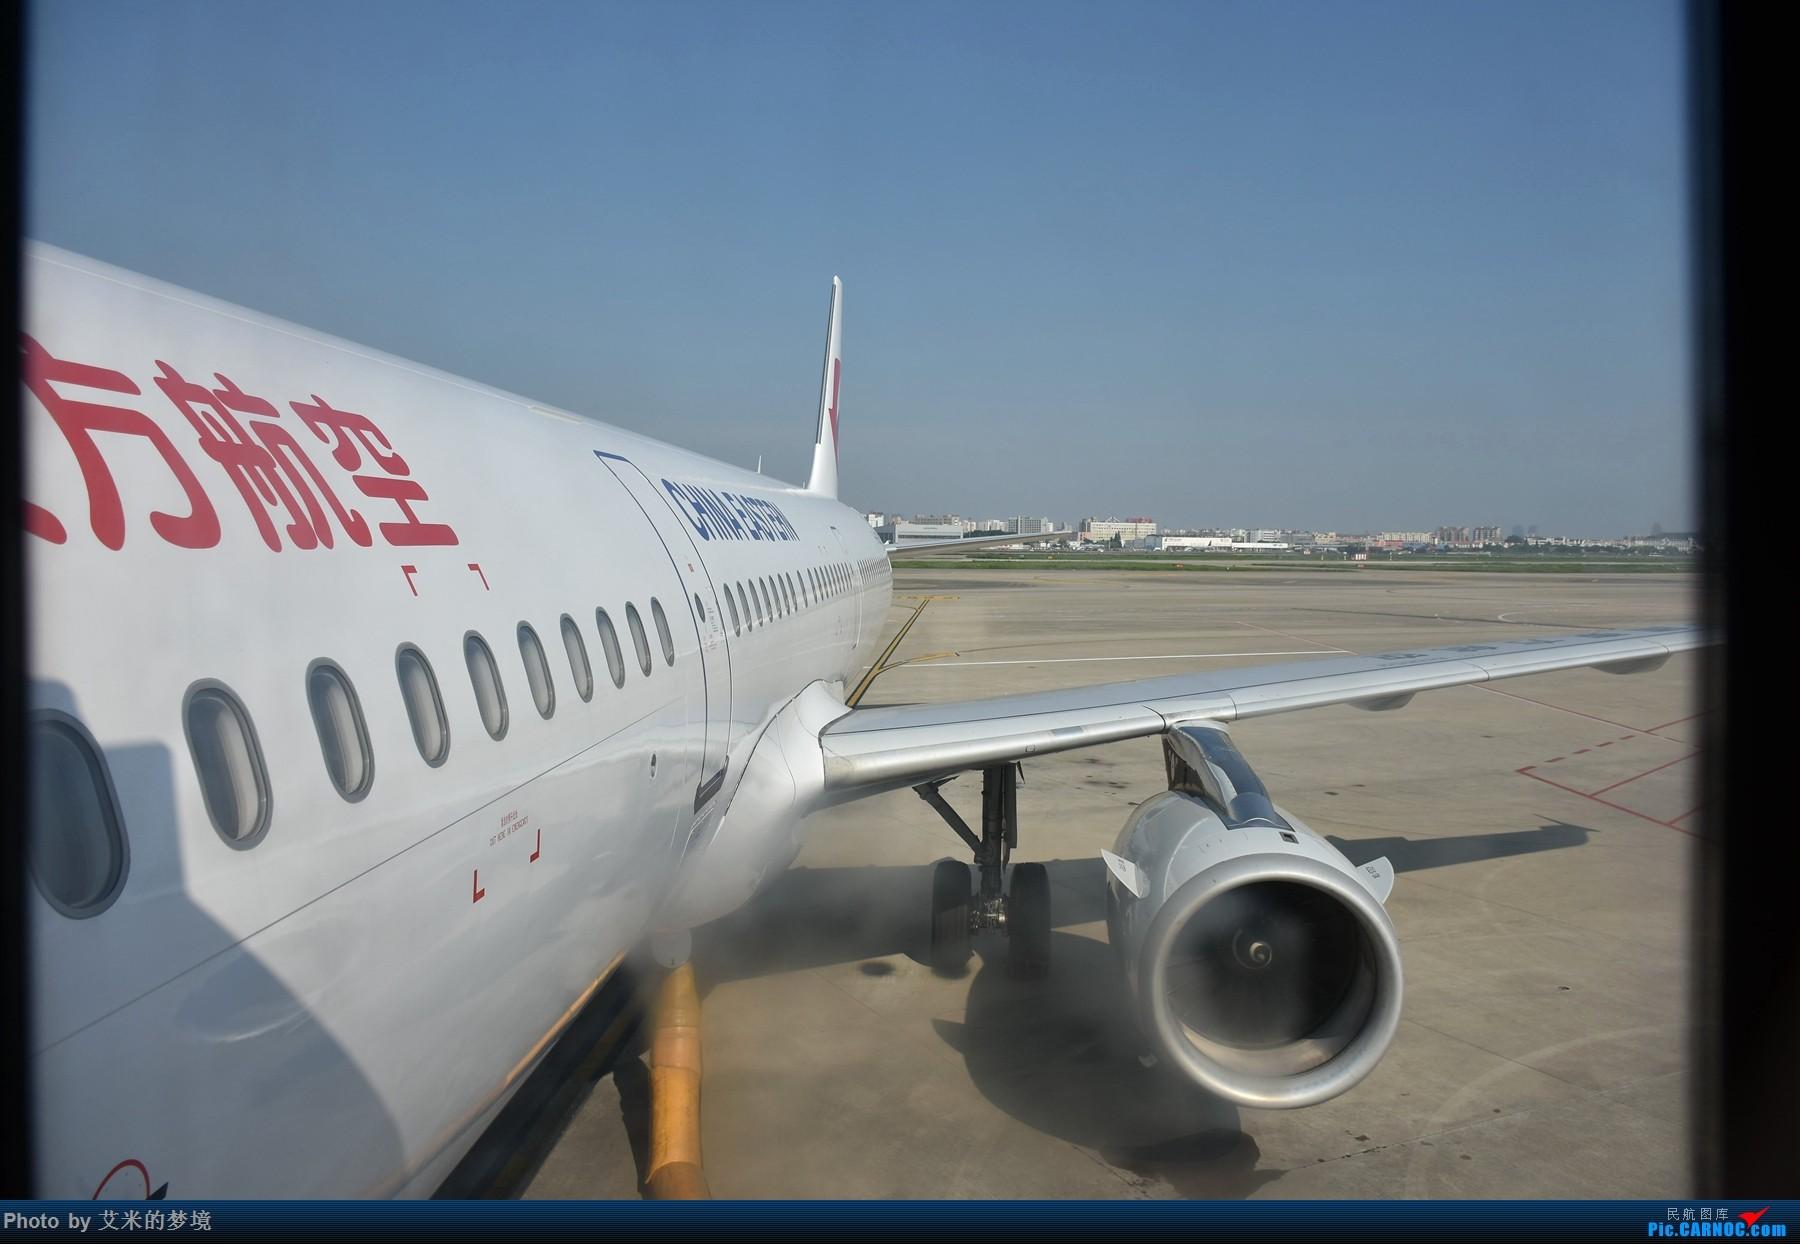 Re:[原创]【carnoc重庆飞友会】北京送行,所见飞行 AIRBUS A321-200 B-6668 中国上海虹桥国际机场